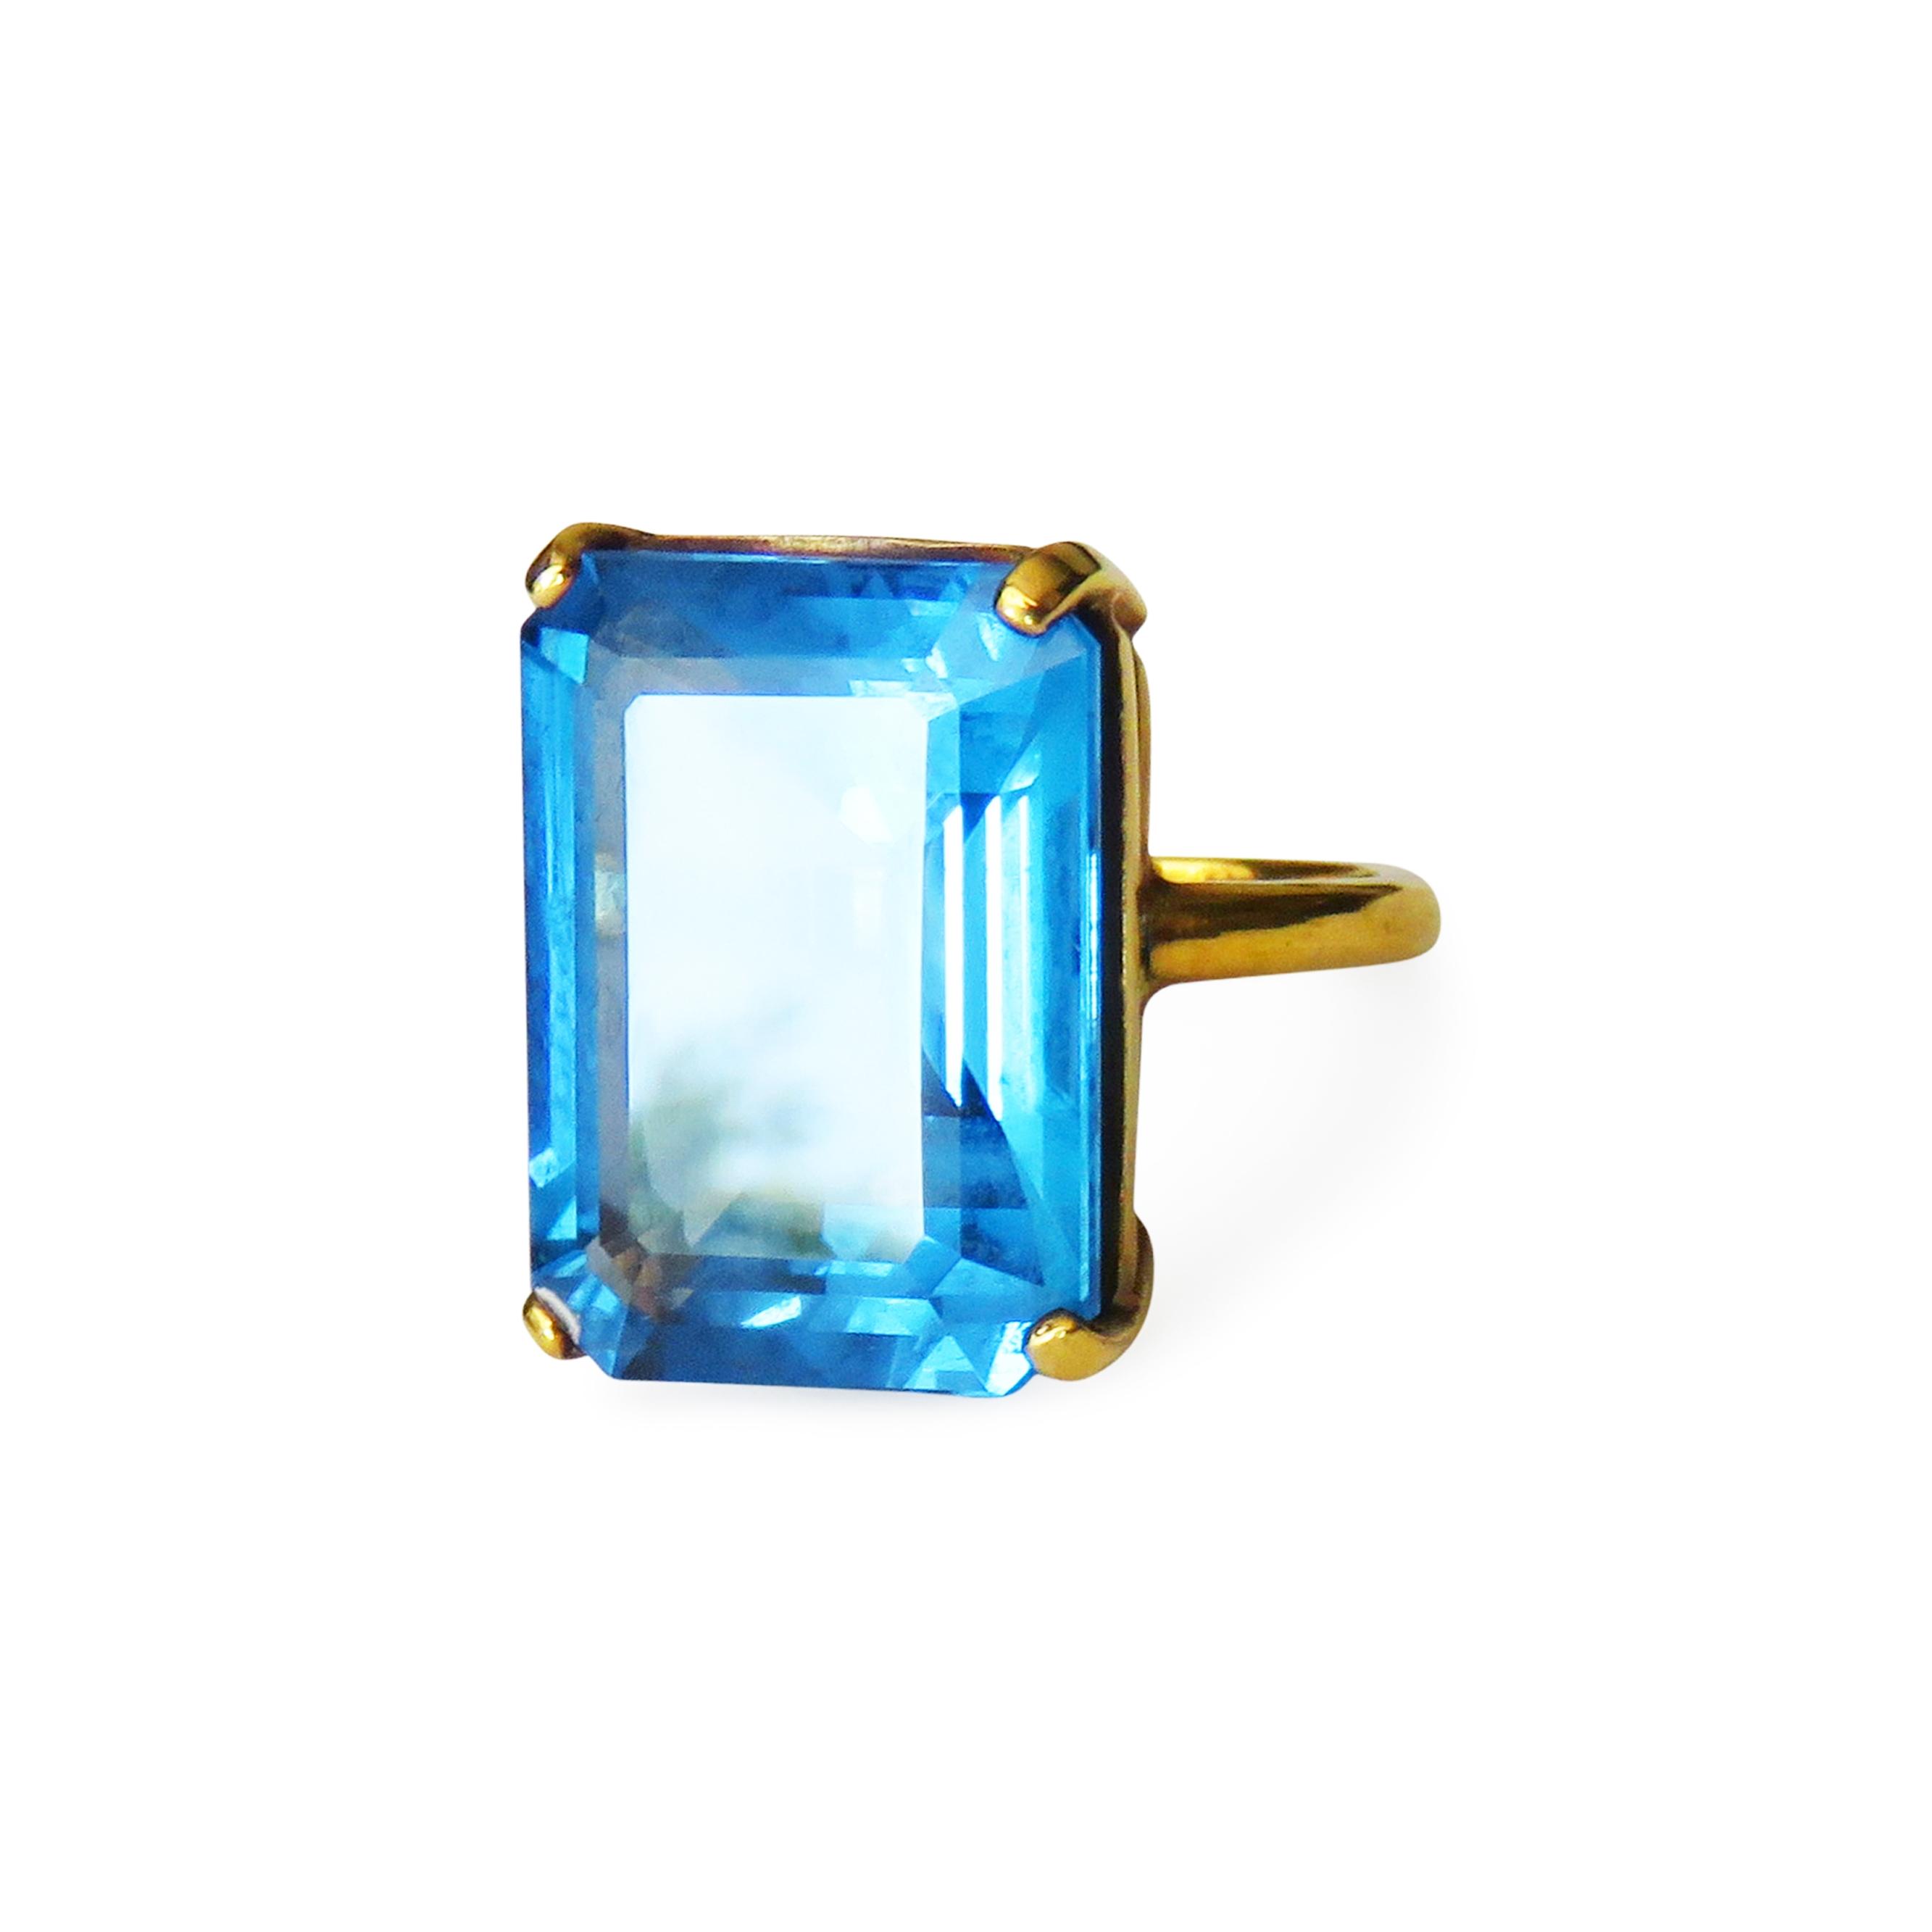 ISABEL ENGLEBERT Princess Blue Topaz Ring